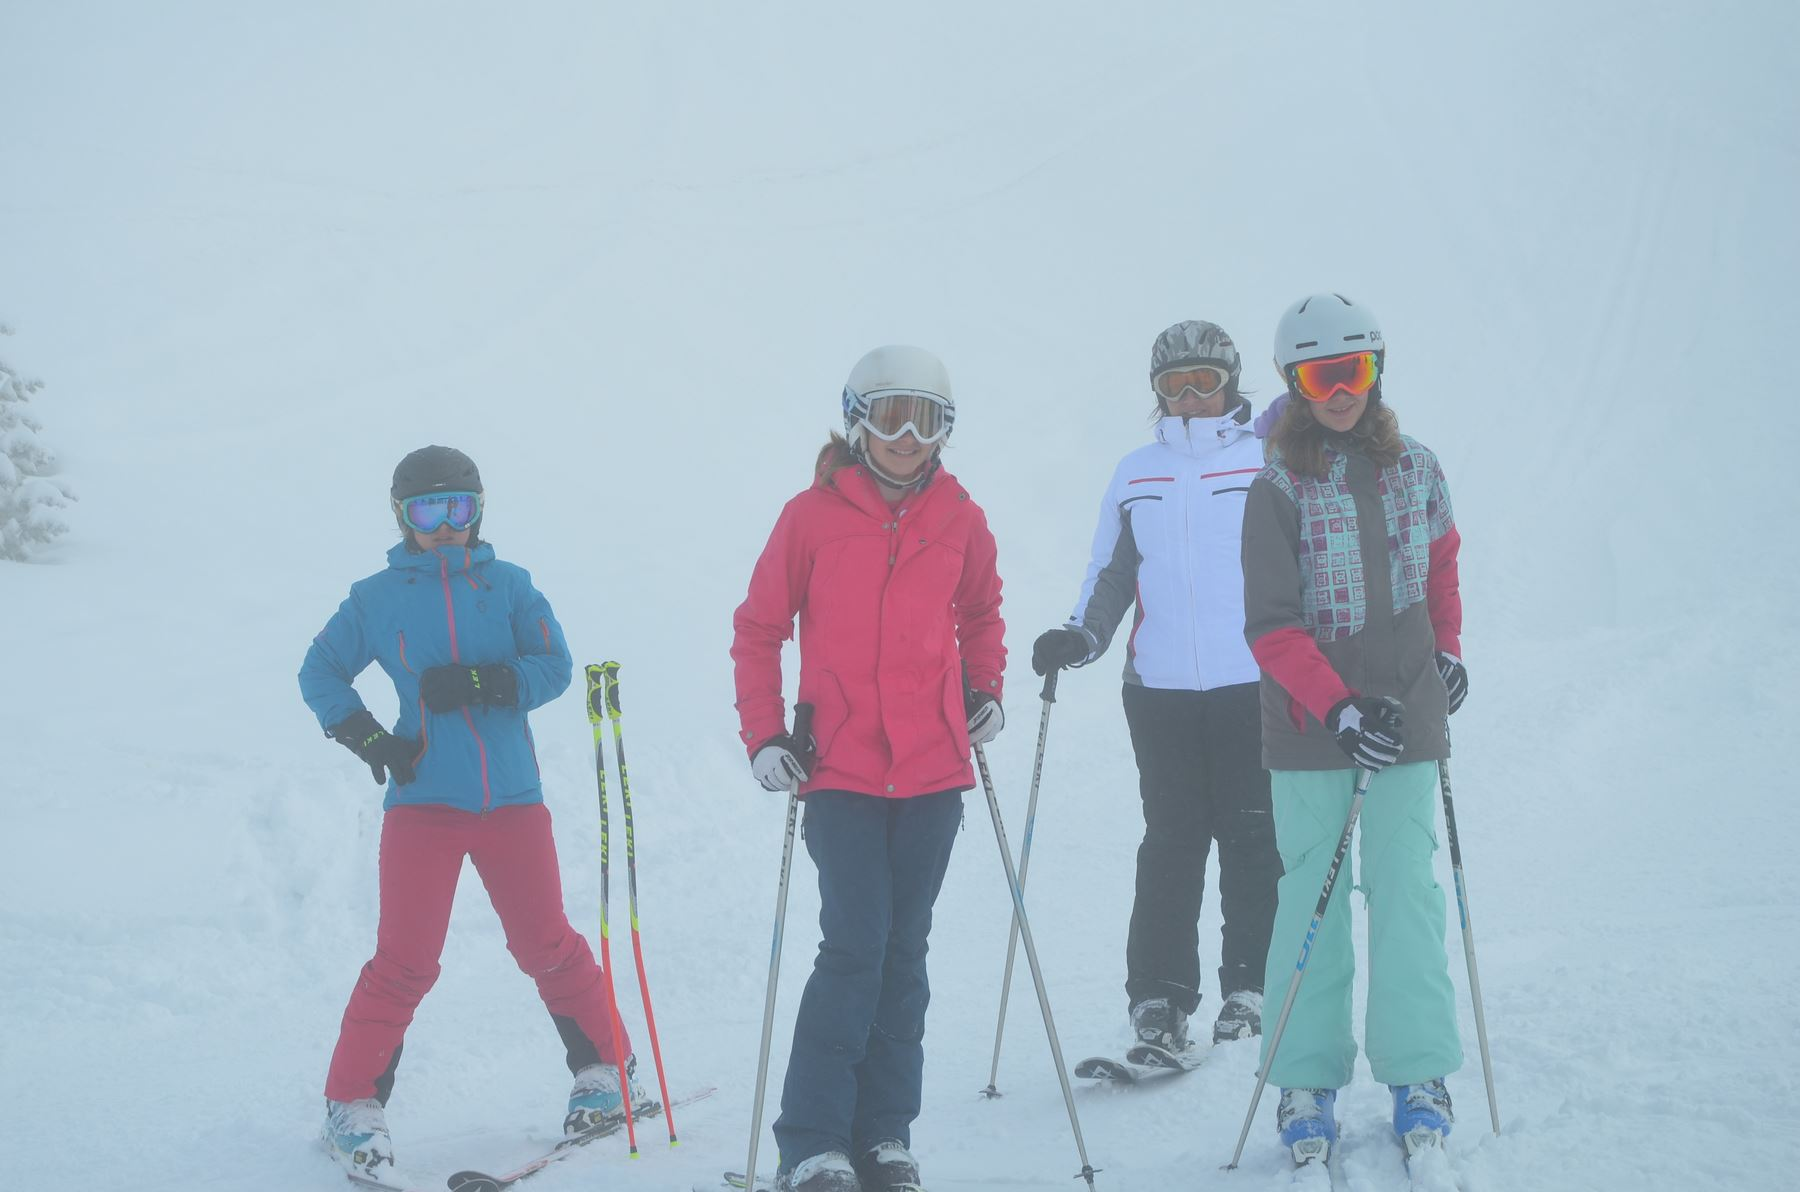 2015-03-22 BV Zillertal Skirennen 020.JPG